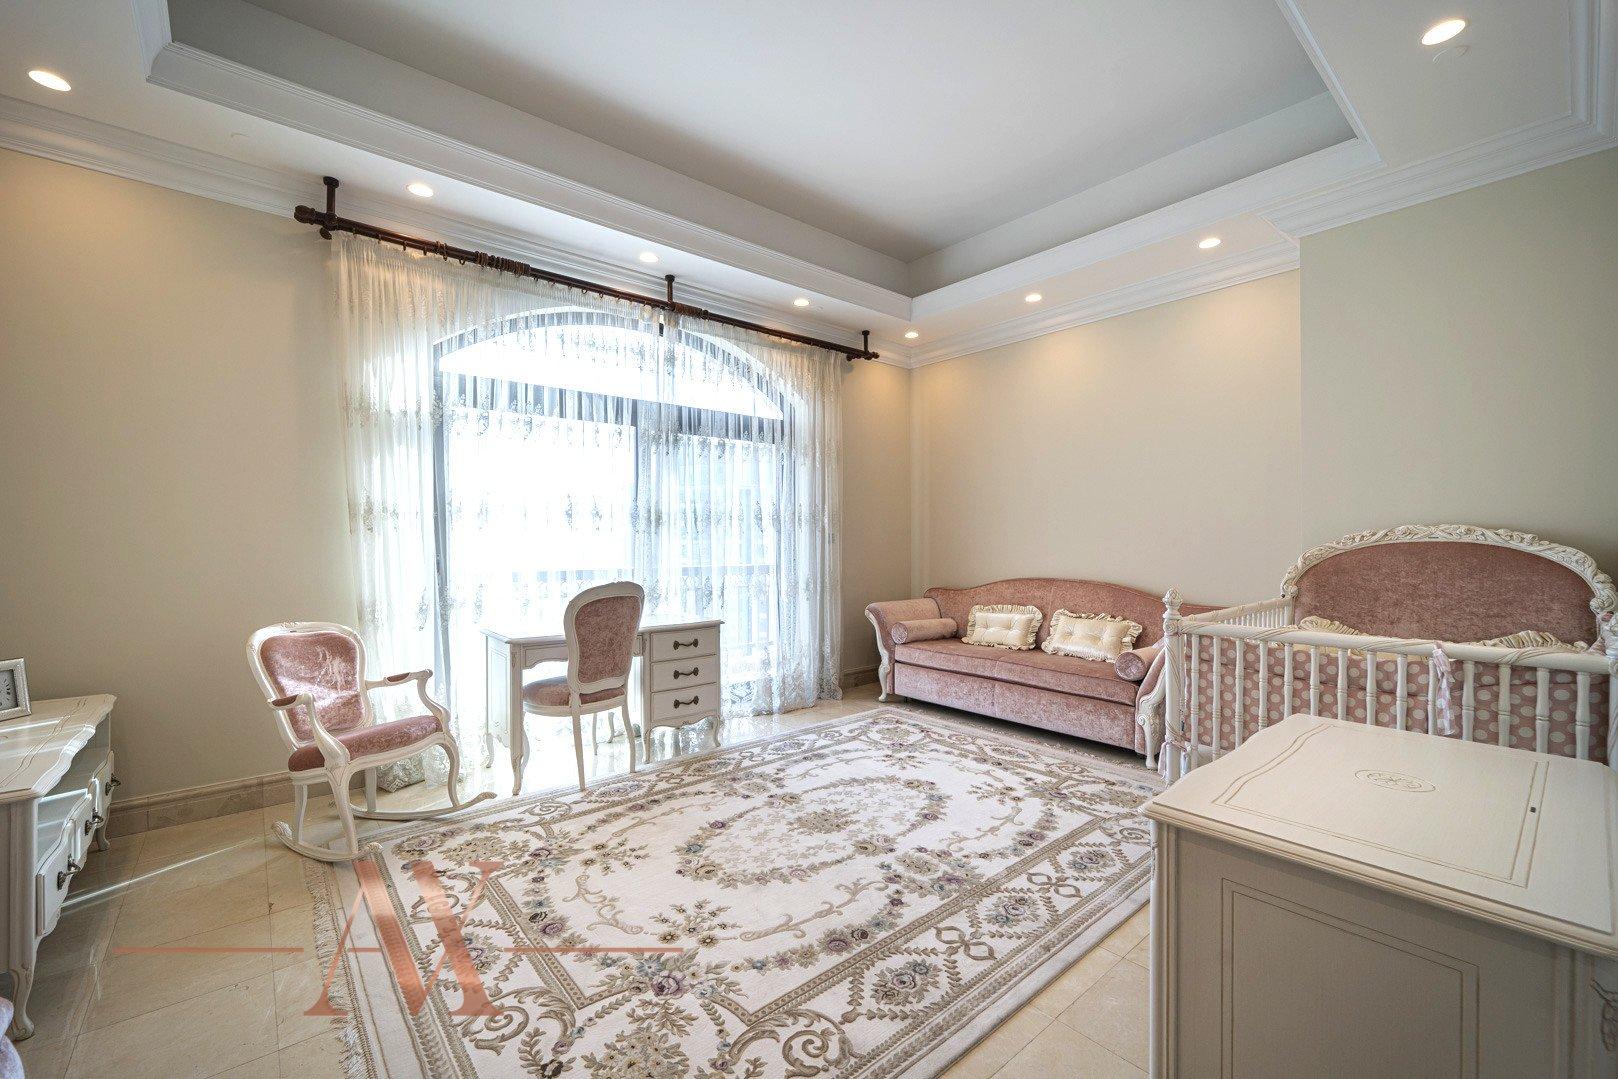 Penthouse for sale in Dubai, UAE, 5 bedrooms, 1057 m2, No. 23747 – photo 9